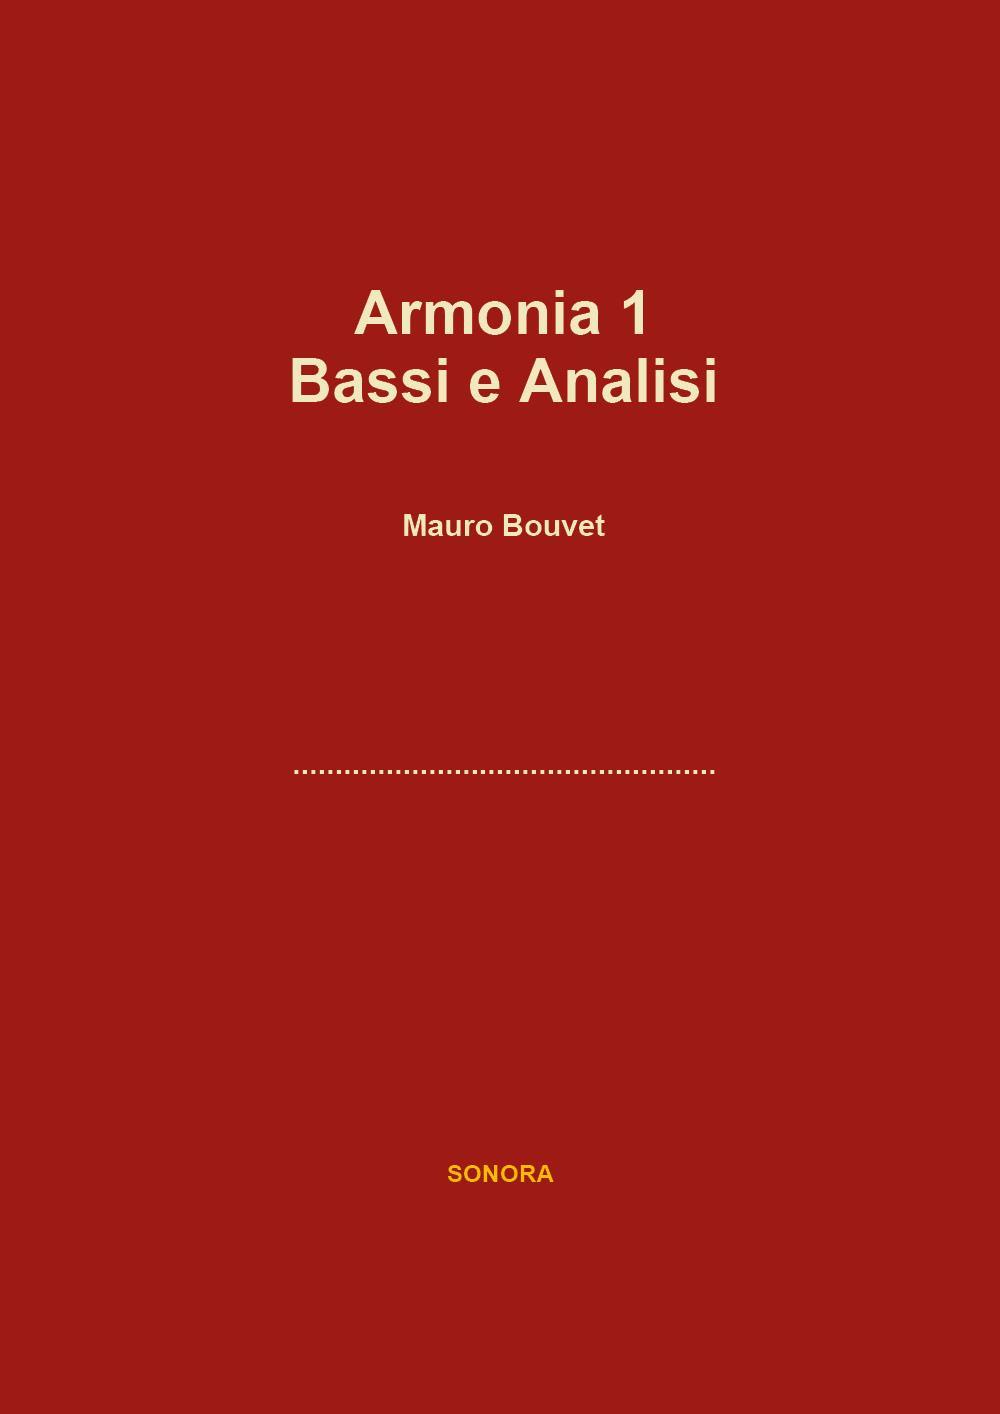 Armonia 1 Bassi e Analisi